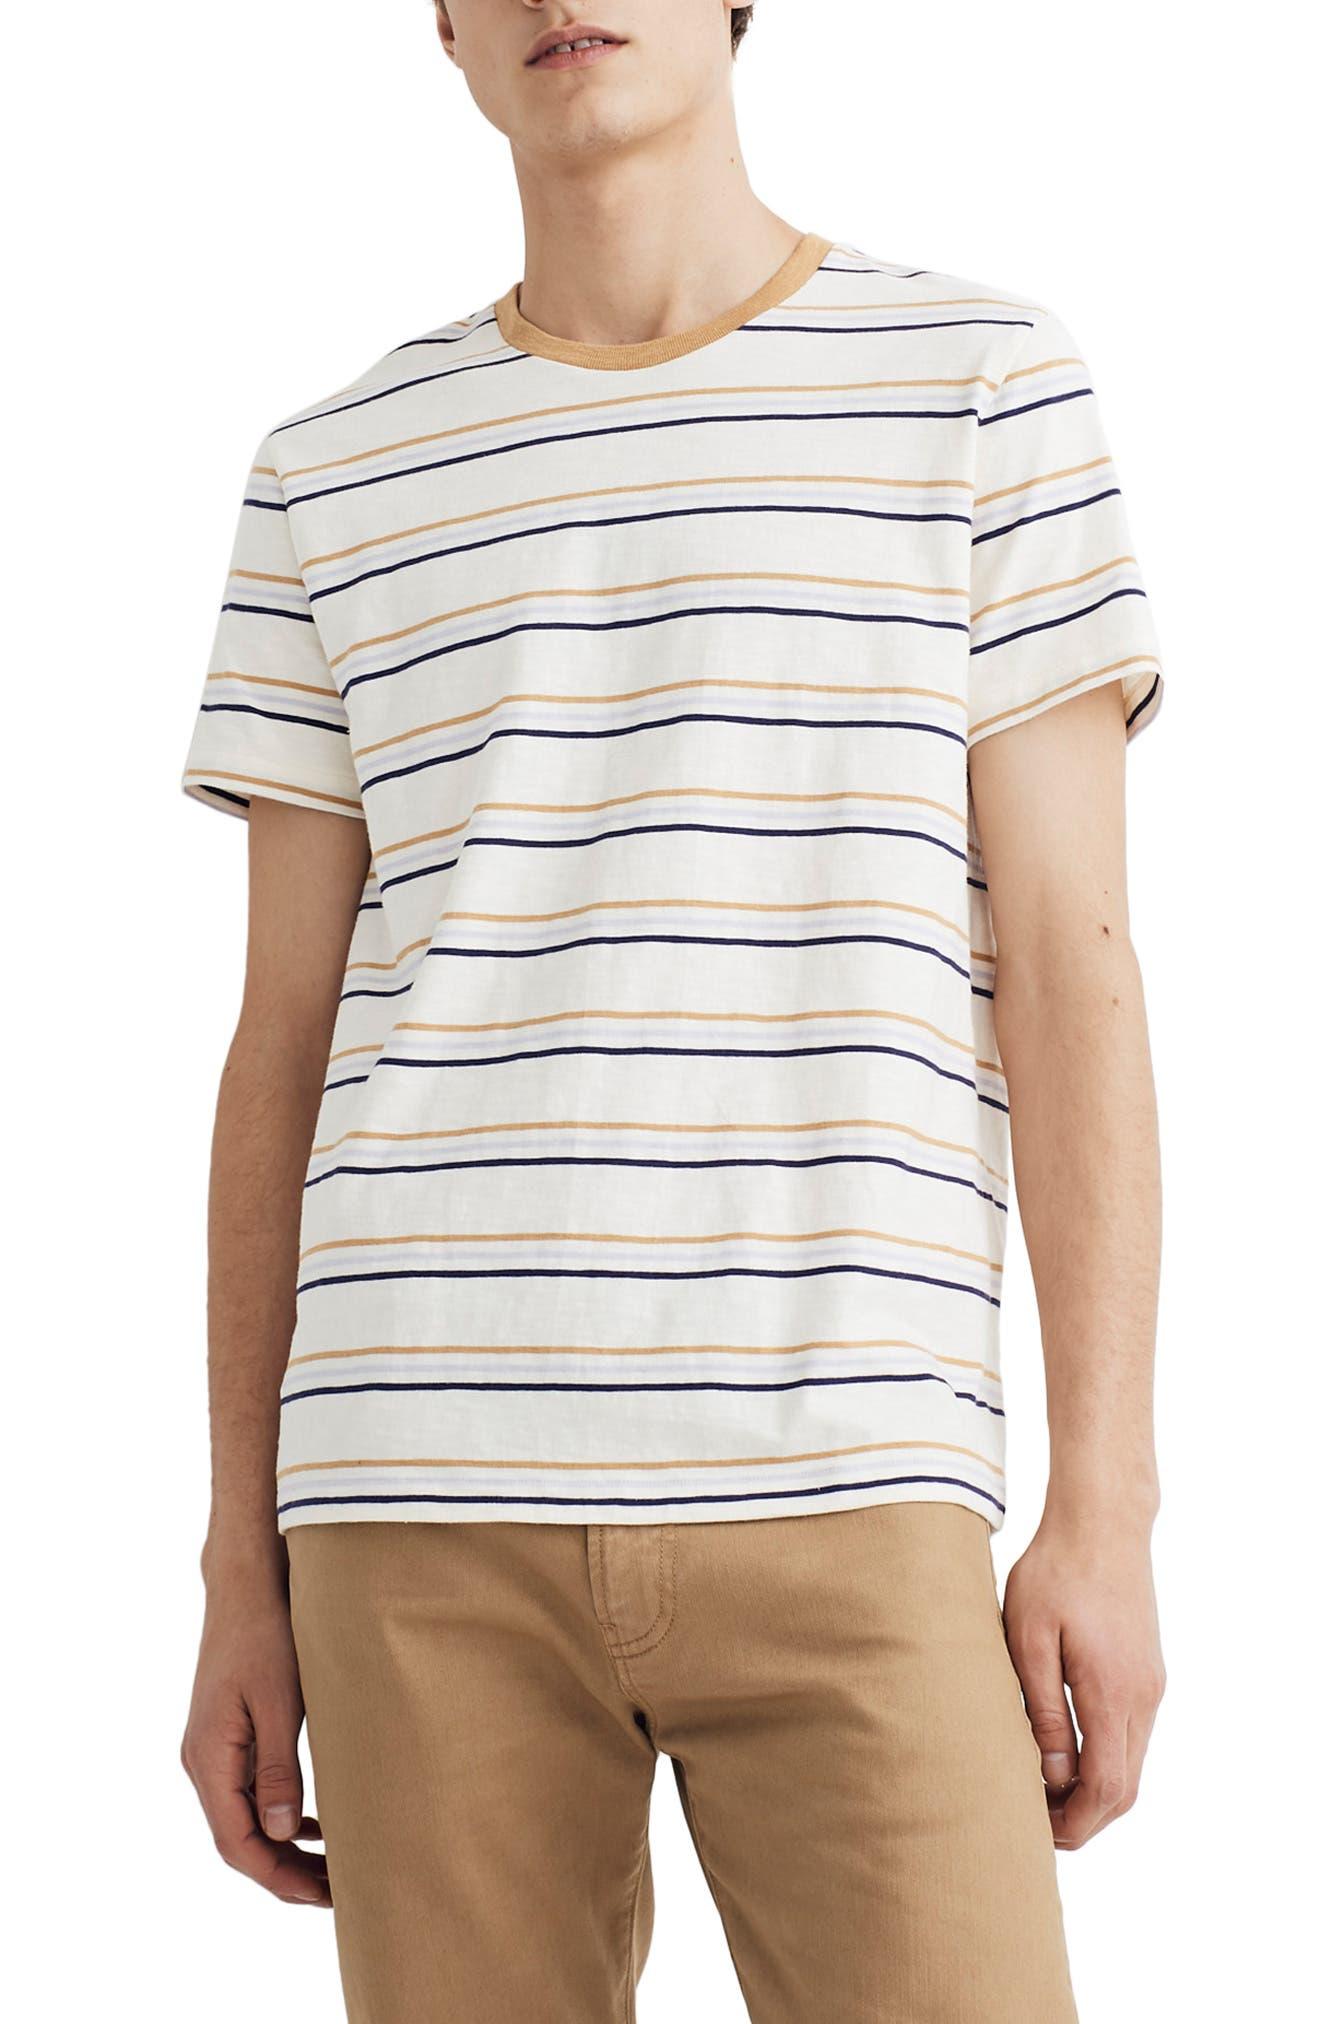 Madewell Essen Stripe Allday Crewneck T-Shirt, Yellow